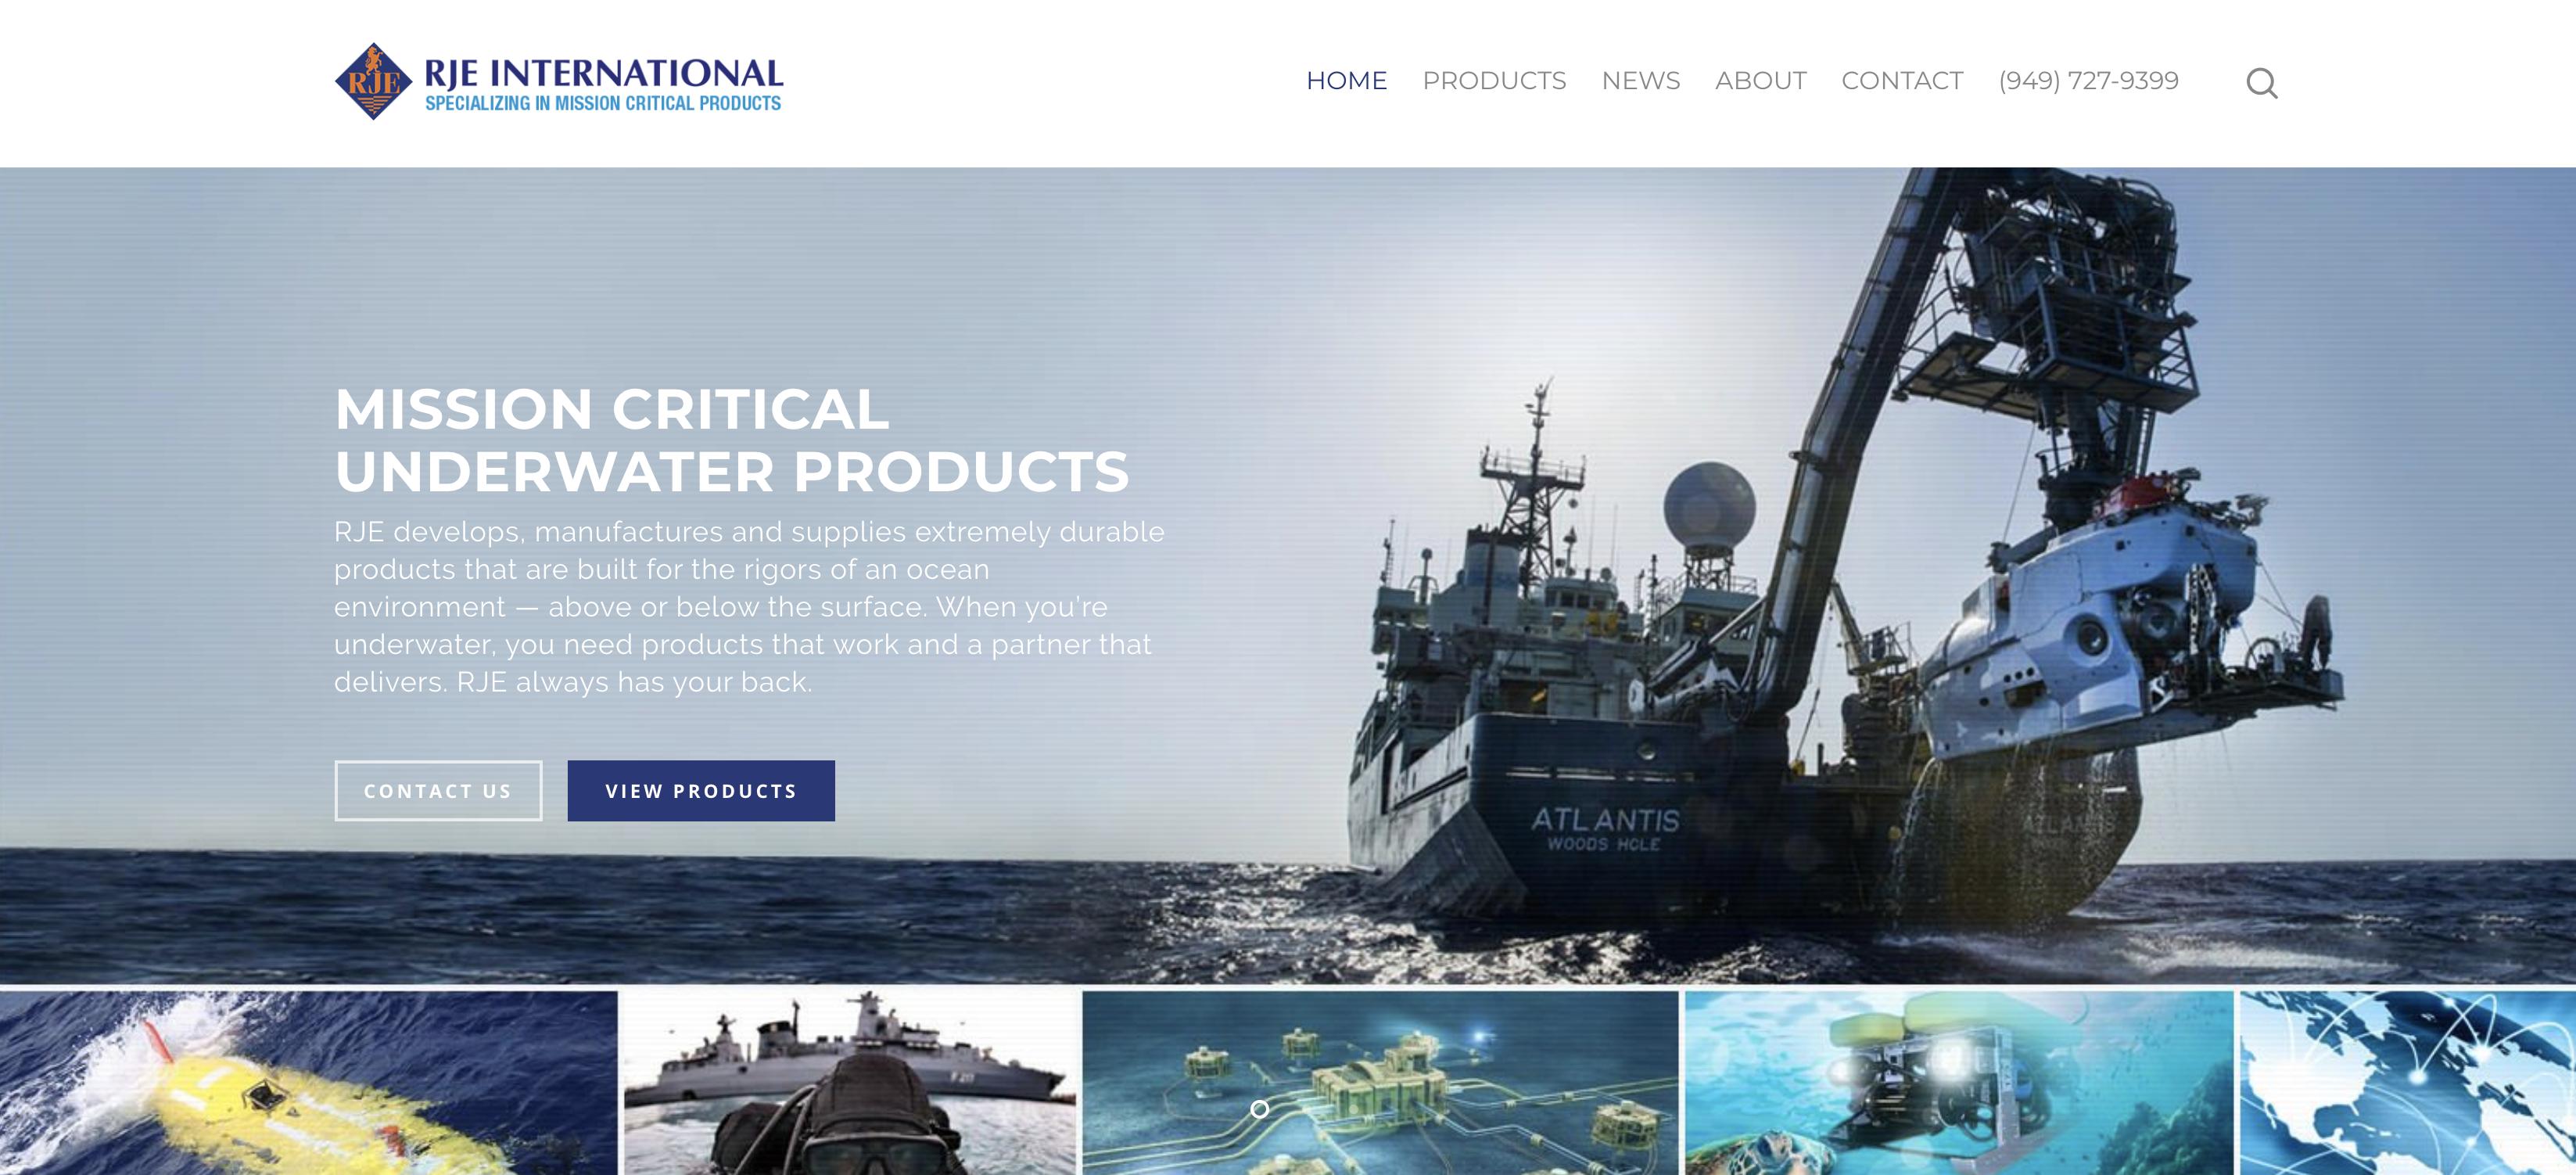 SRV-8 parent company RJE International homepage